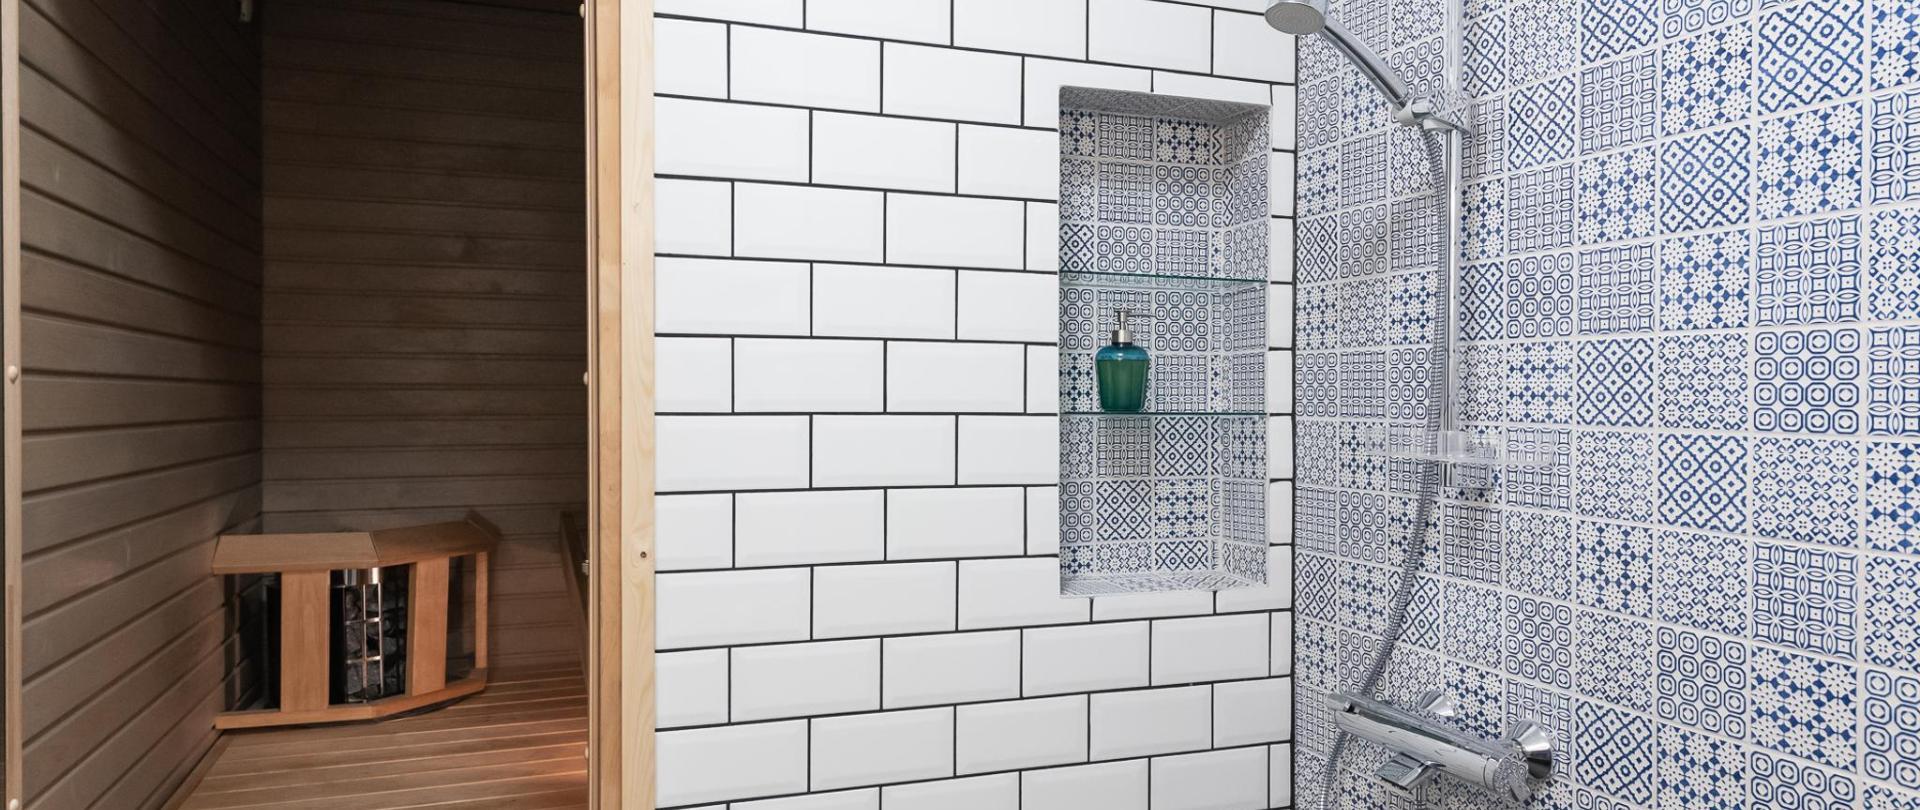 Sauna ja kylpyhuone